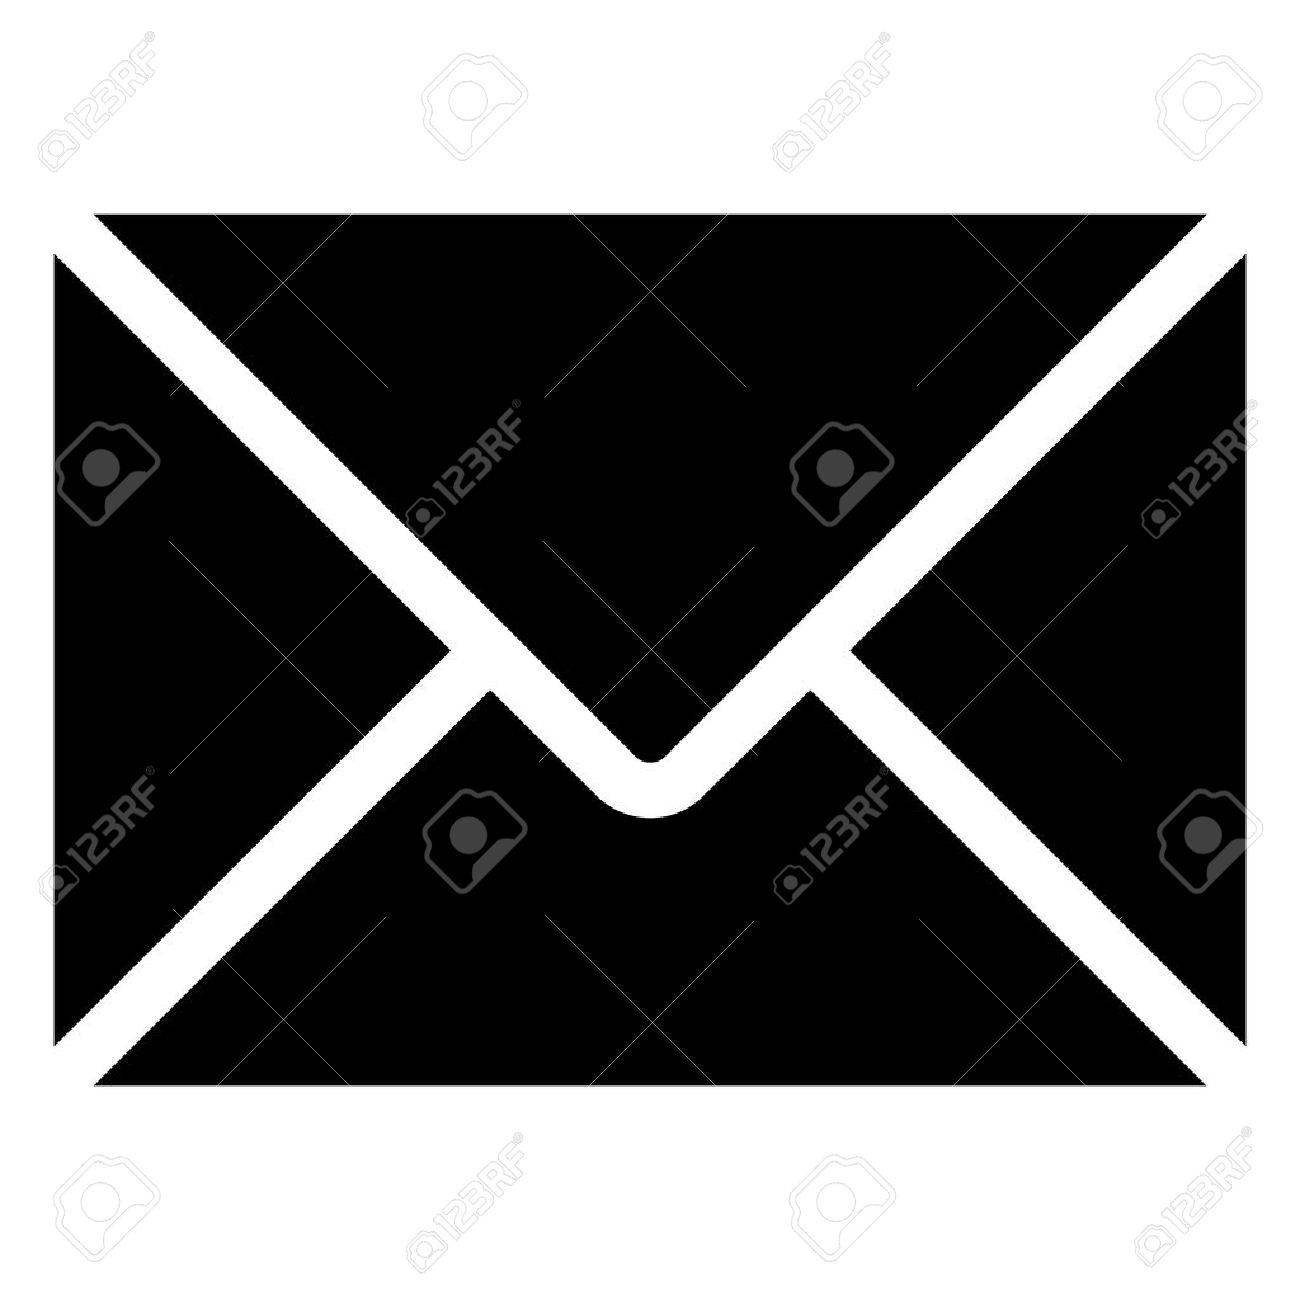 vector black envelope icon on white background. eps 10. - 38196536